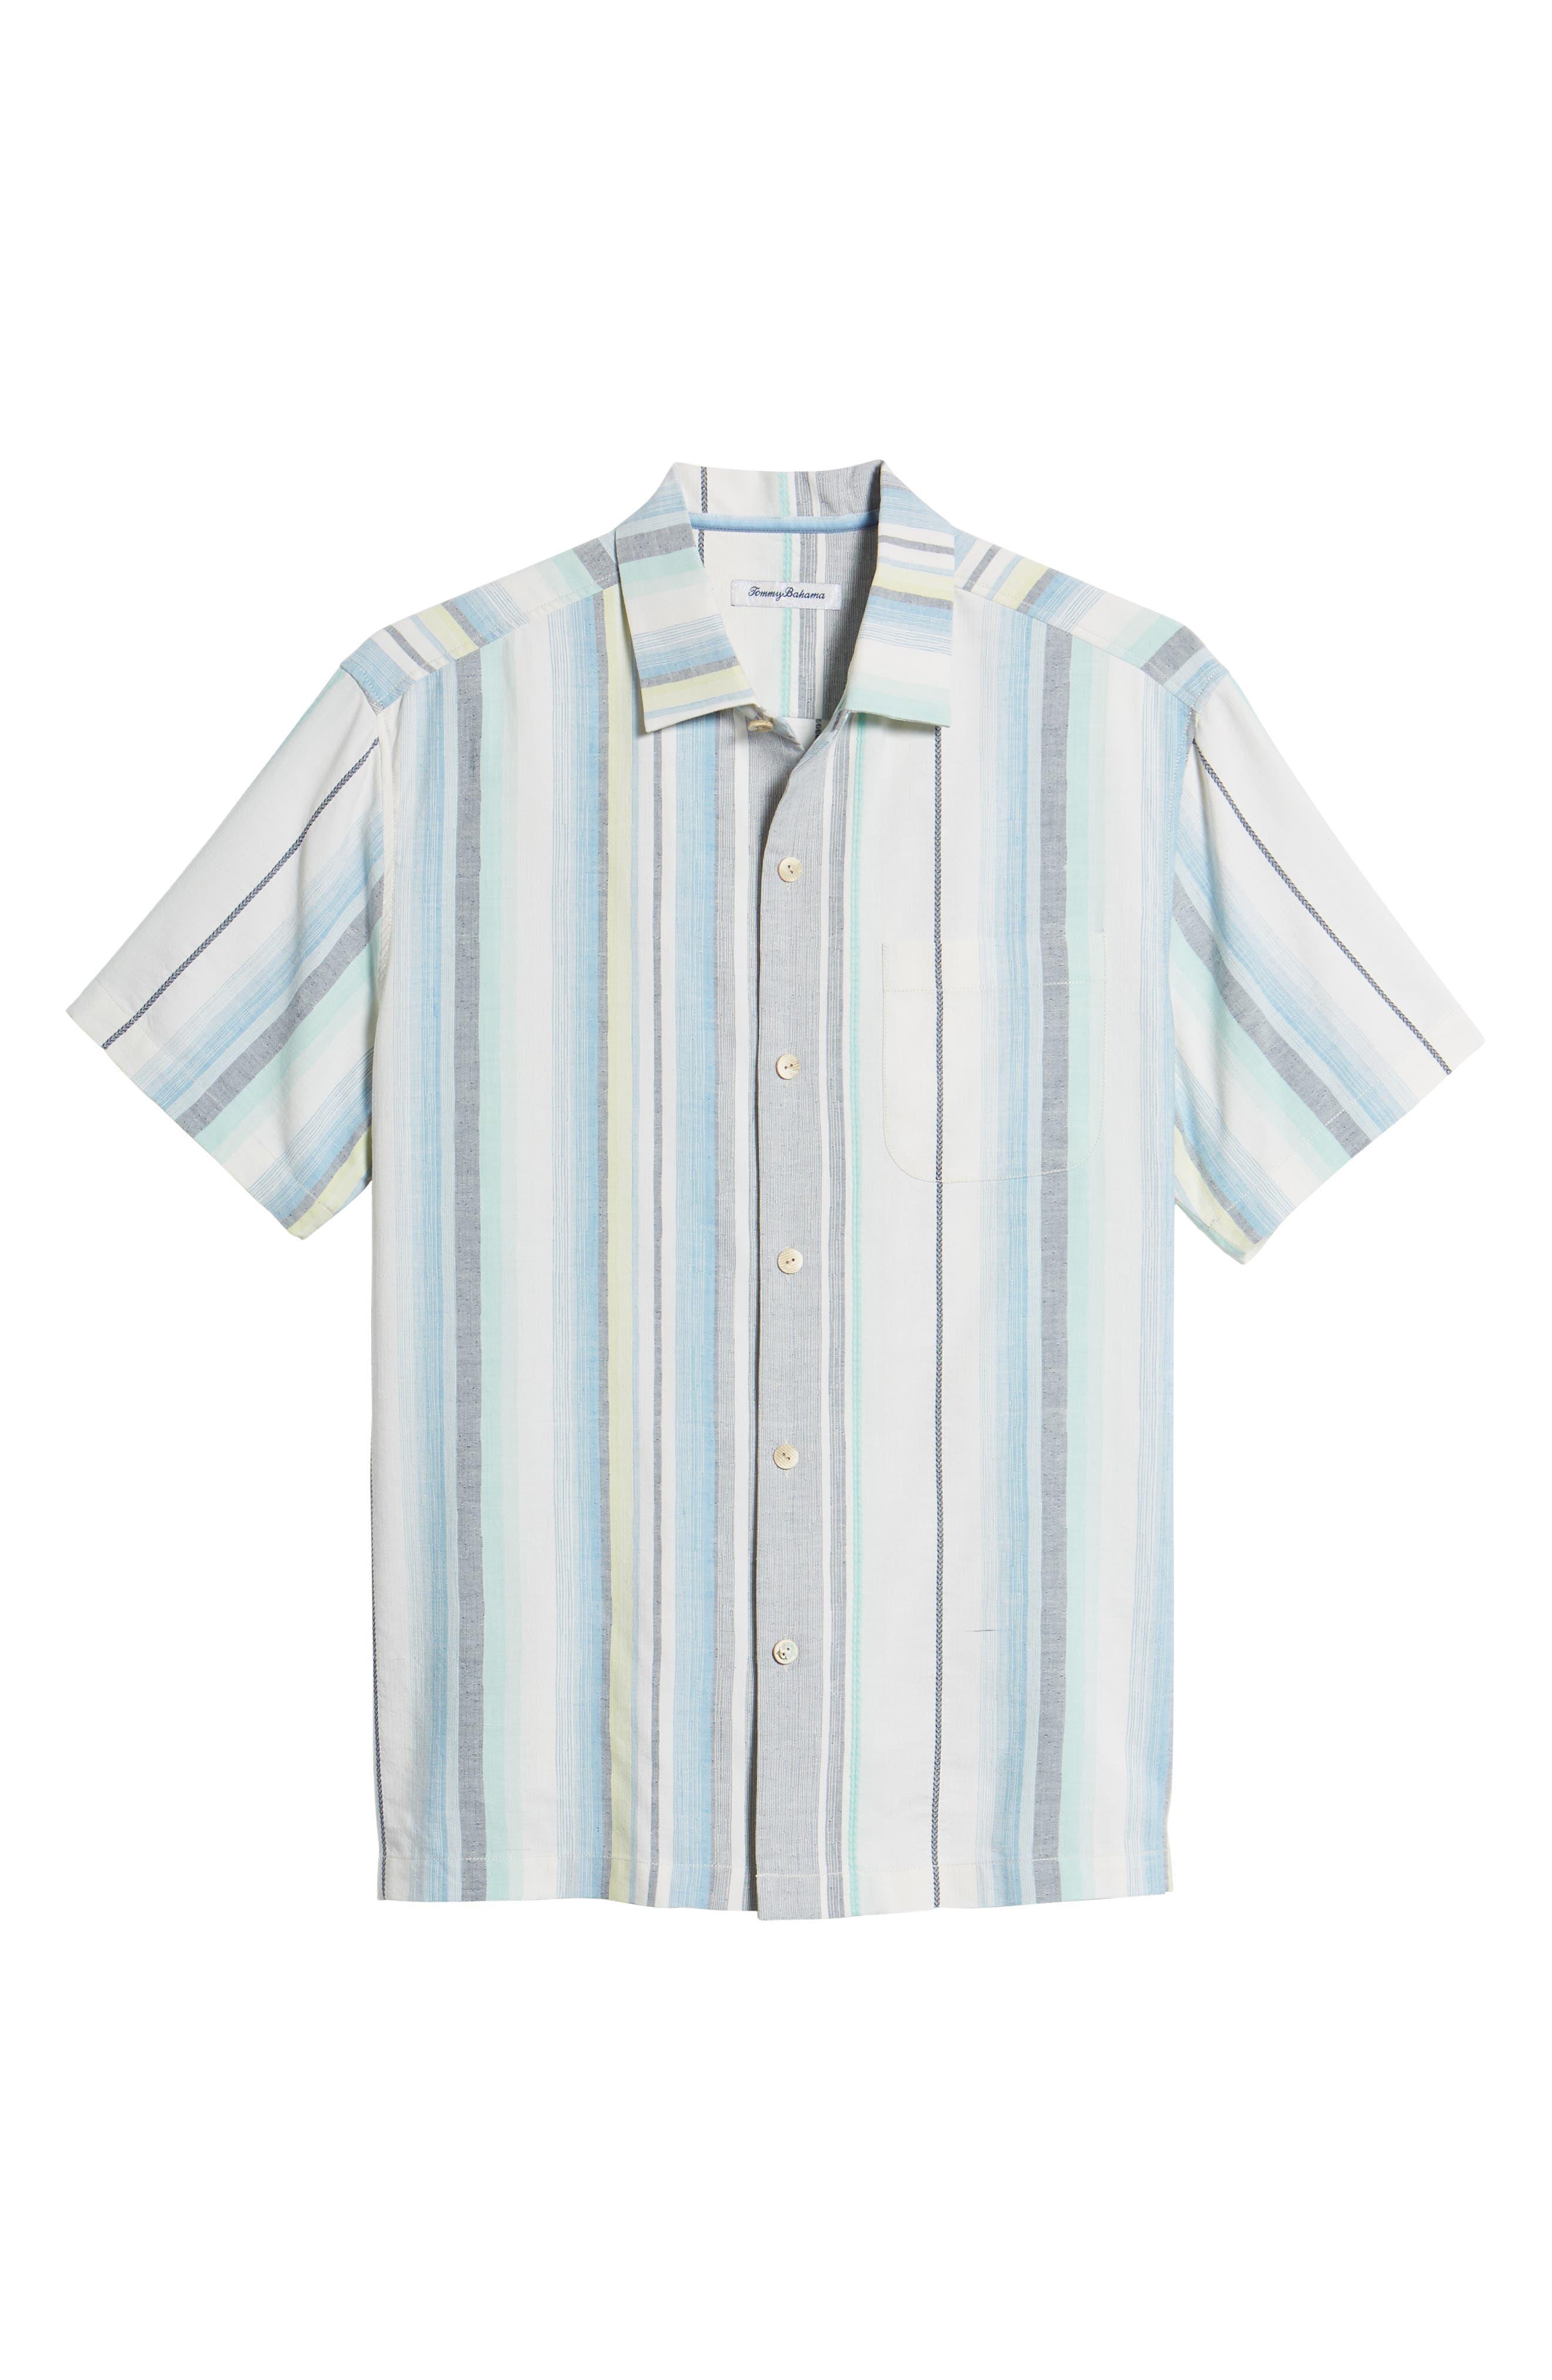 Posado Sands Silk Camp Shirt,                             Alternate thumbnail 6, color,                             Blue Aster